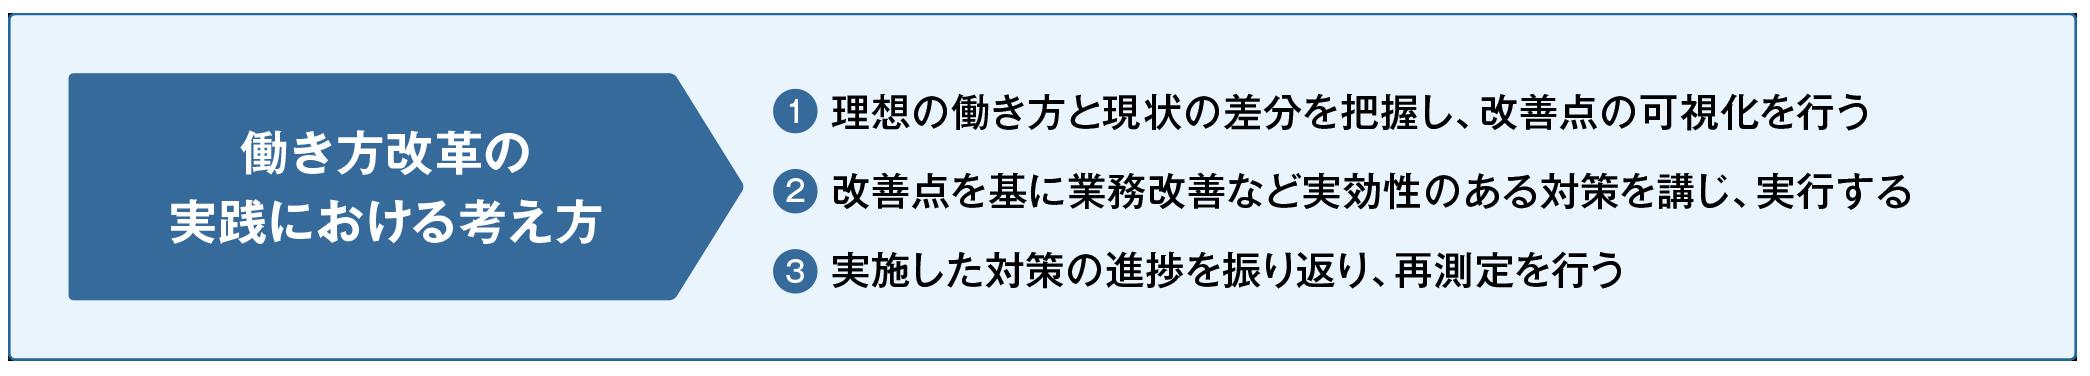 f:id:sky-pca:20191015132350p:plain